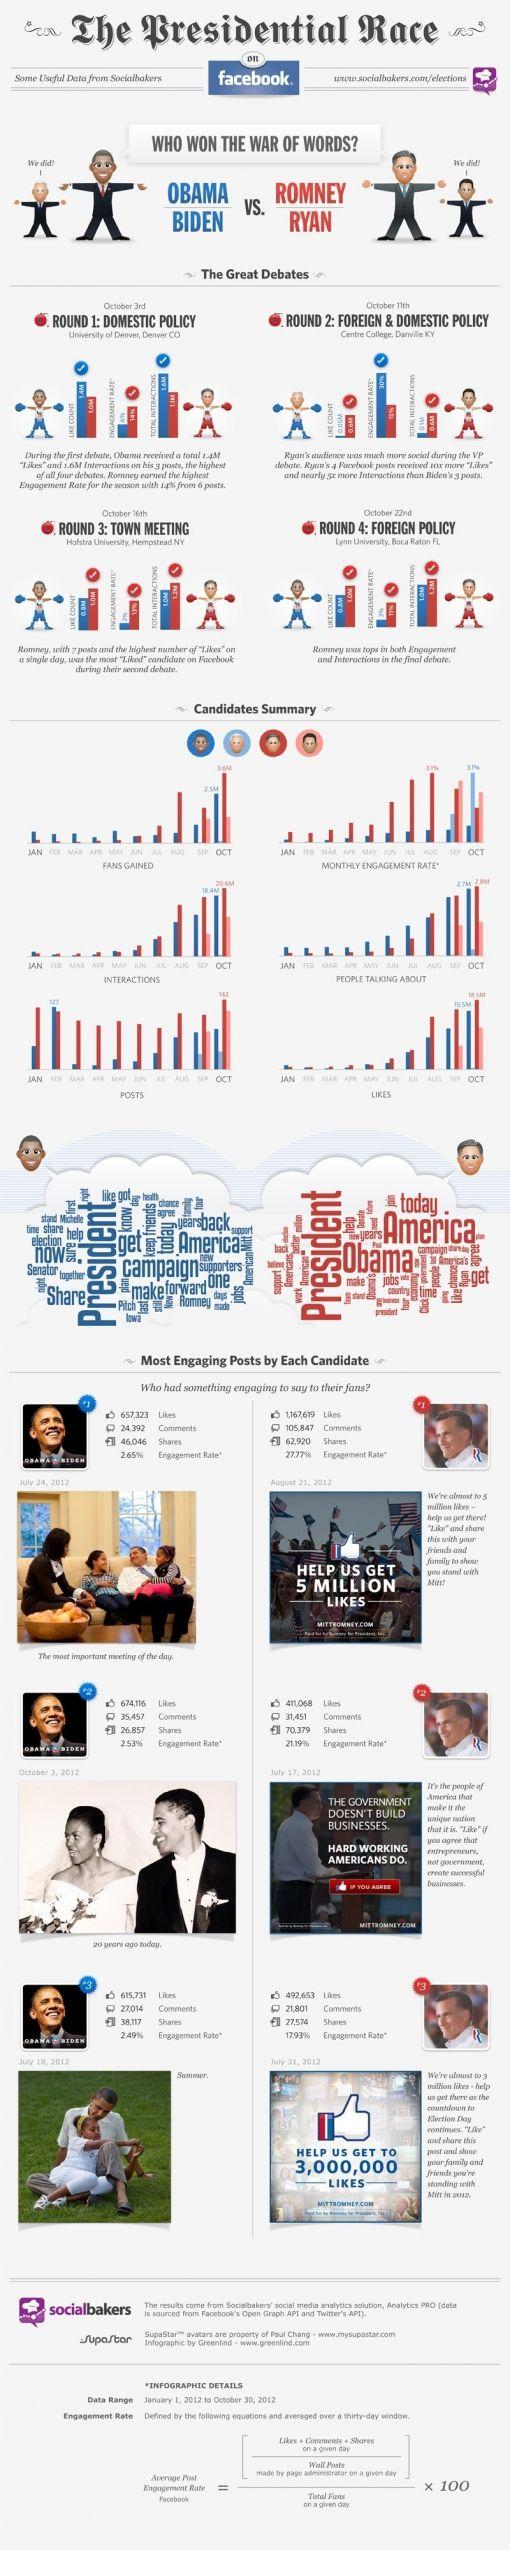 infographic-obama-v-romney-final1